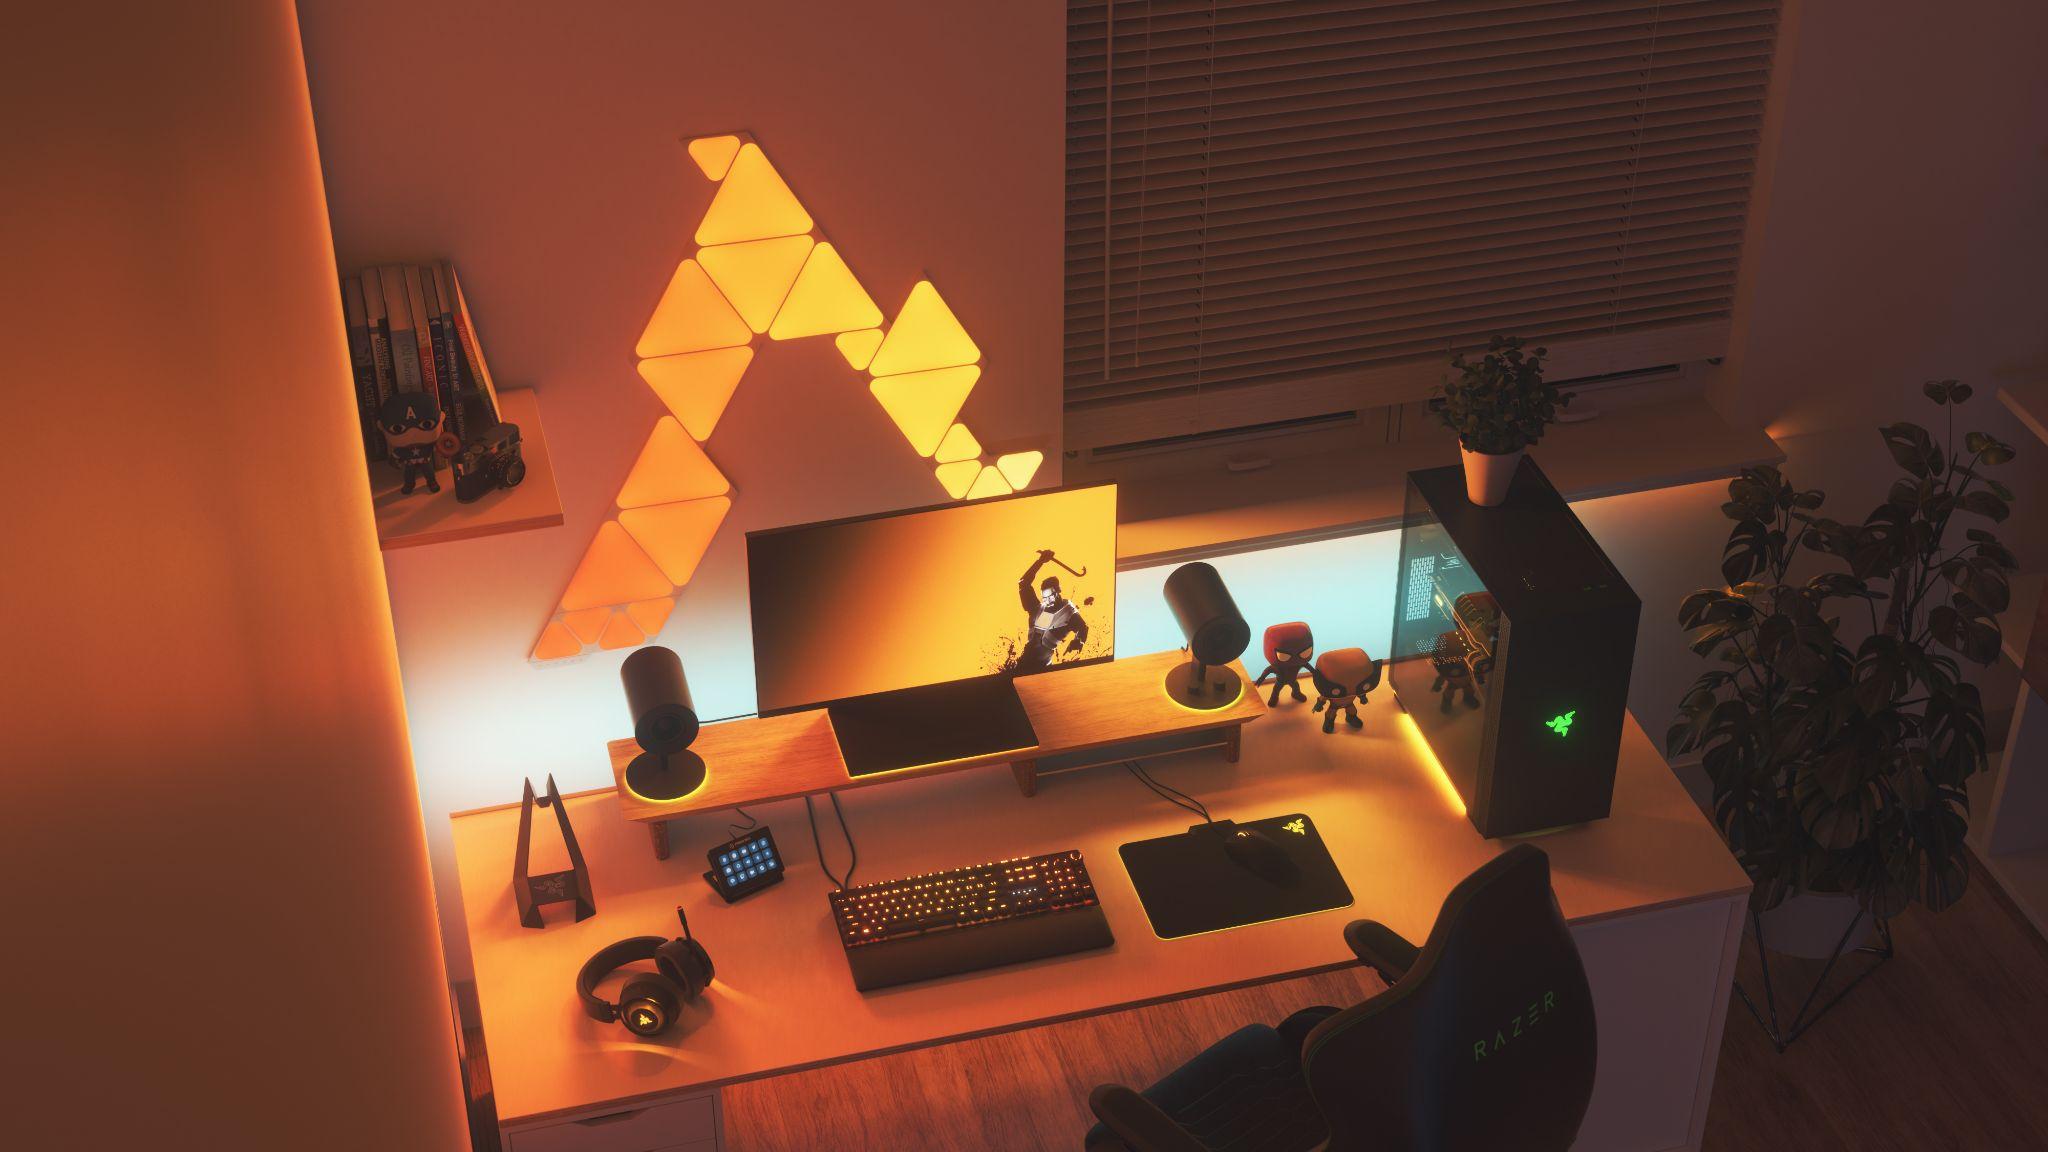 RBG battlestation PC gaming setup with smart lighting features